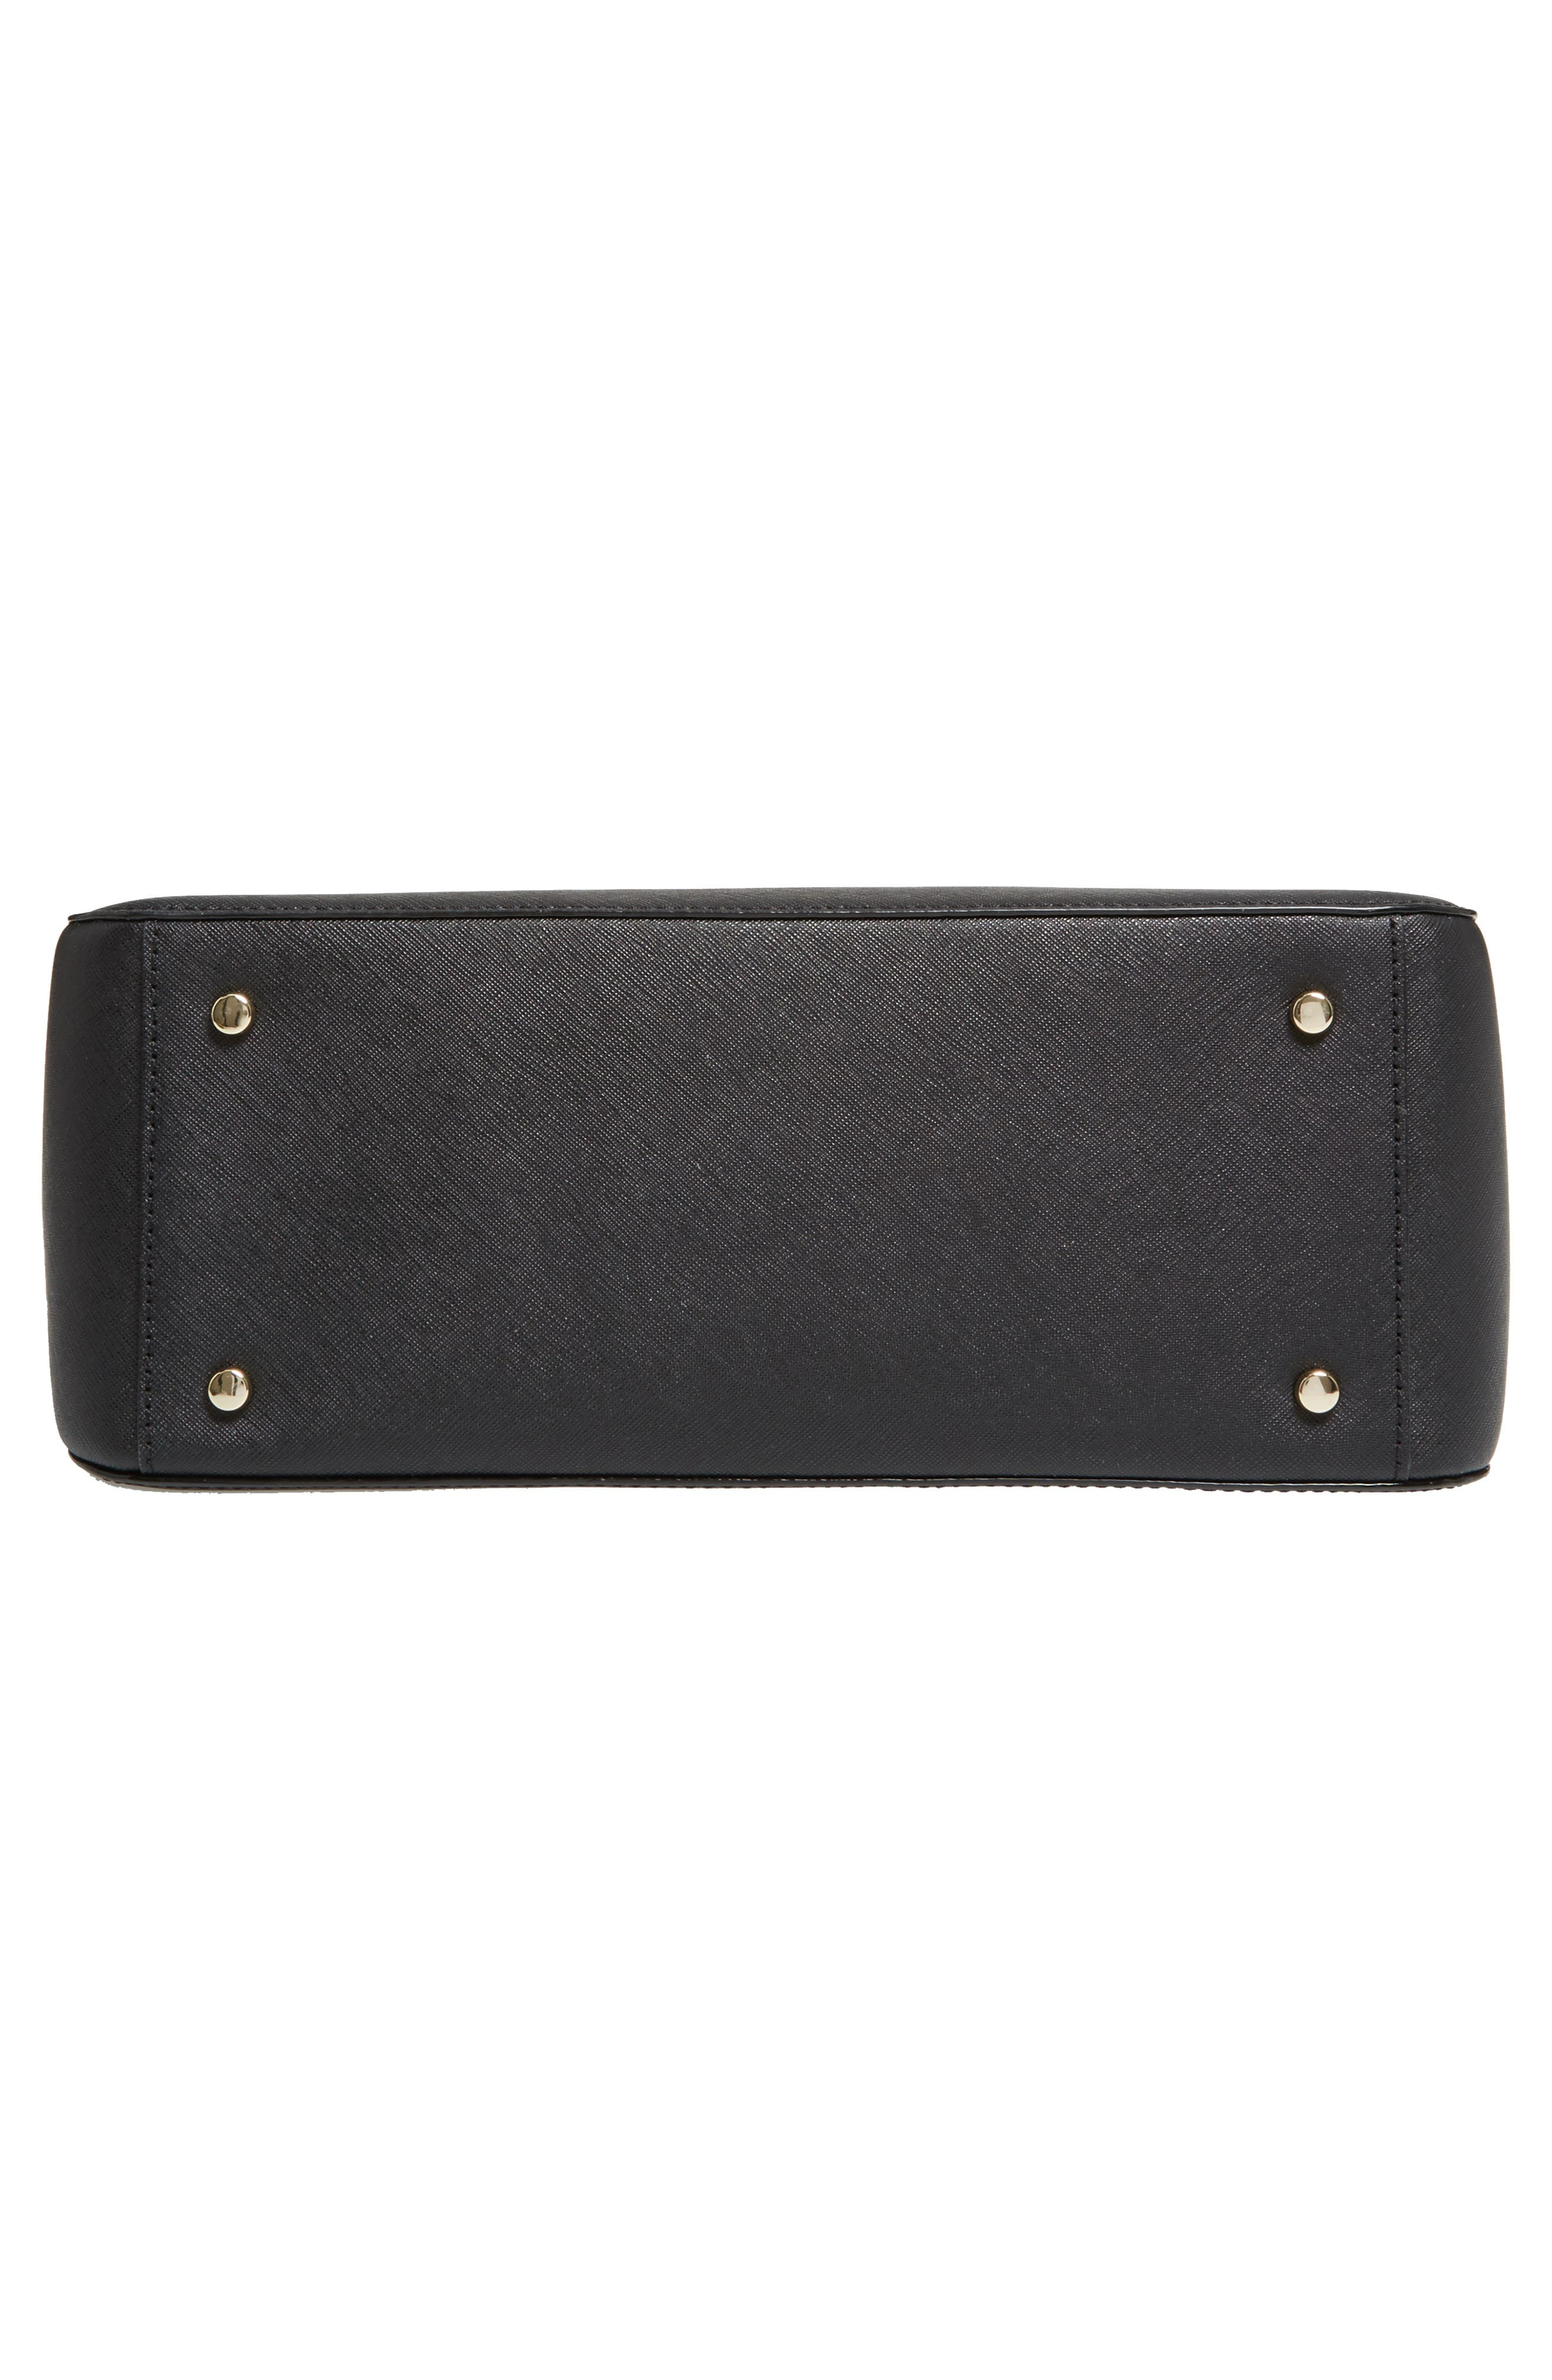 cameron street - sally leather satchel,                             Alternate thumbnail 6, color,                             001